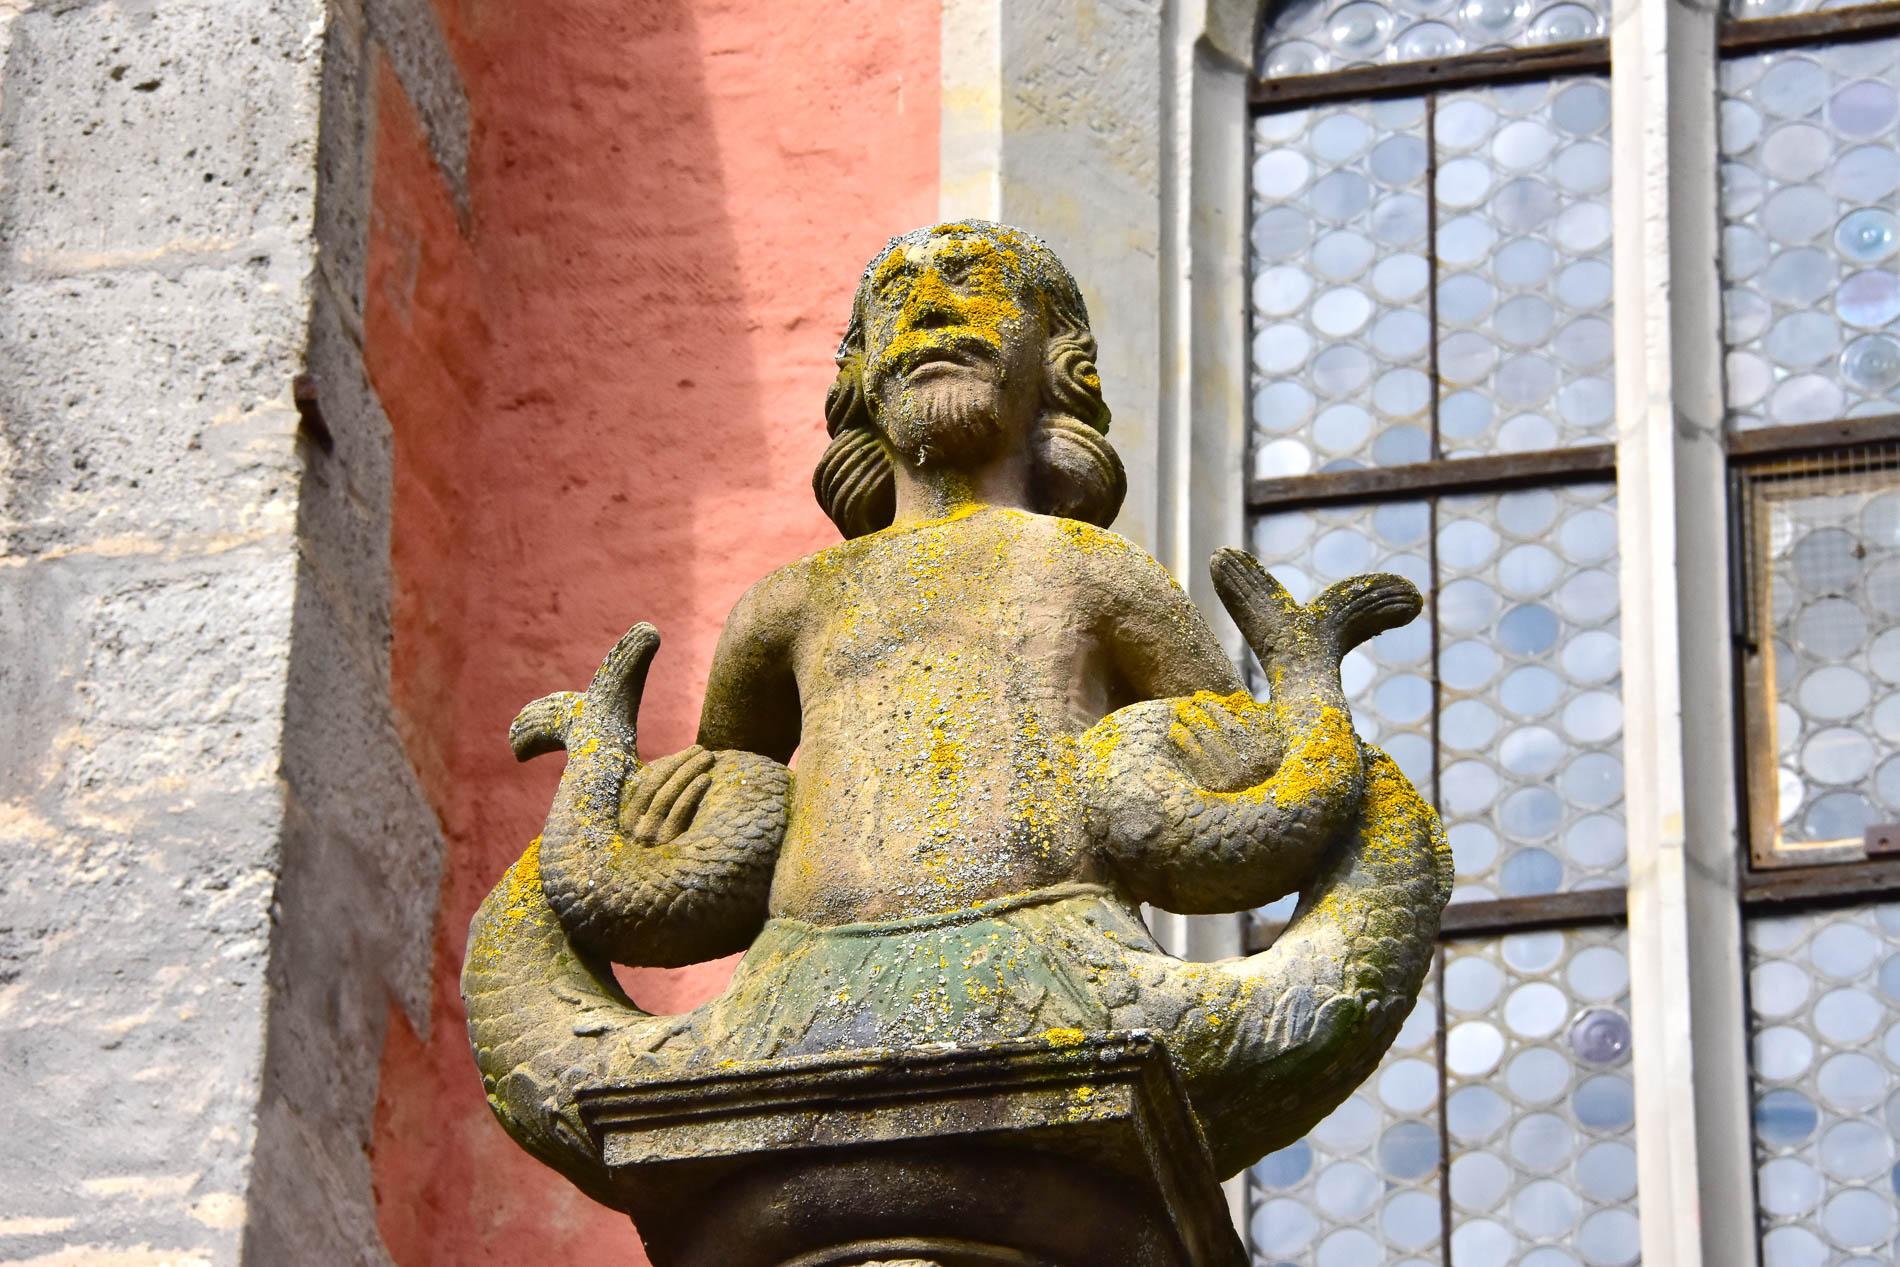 Merman Statue